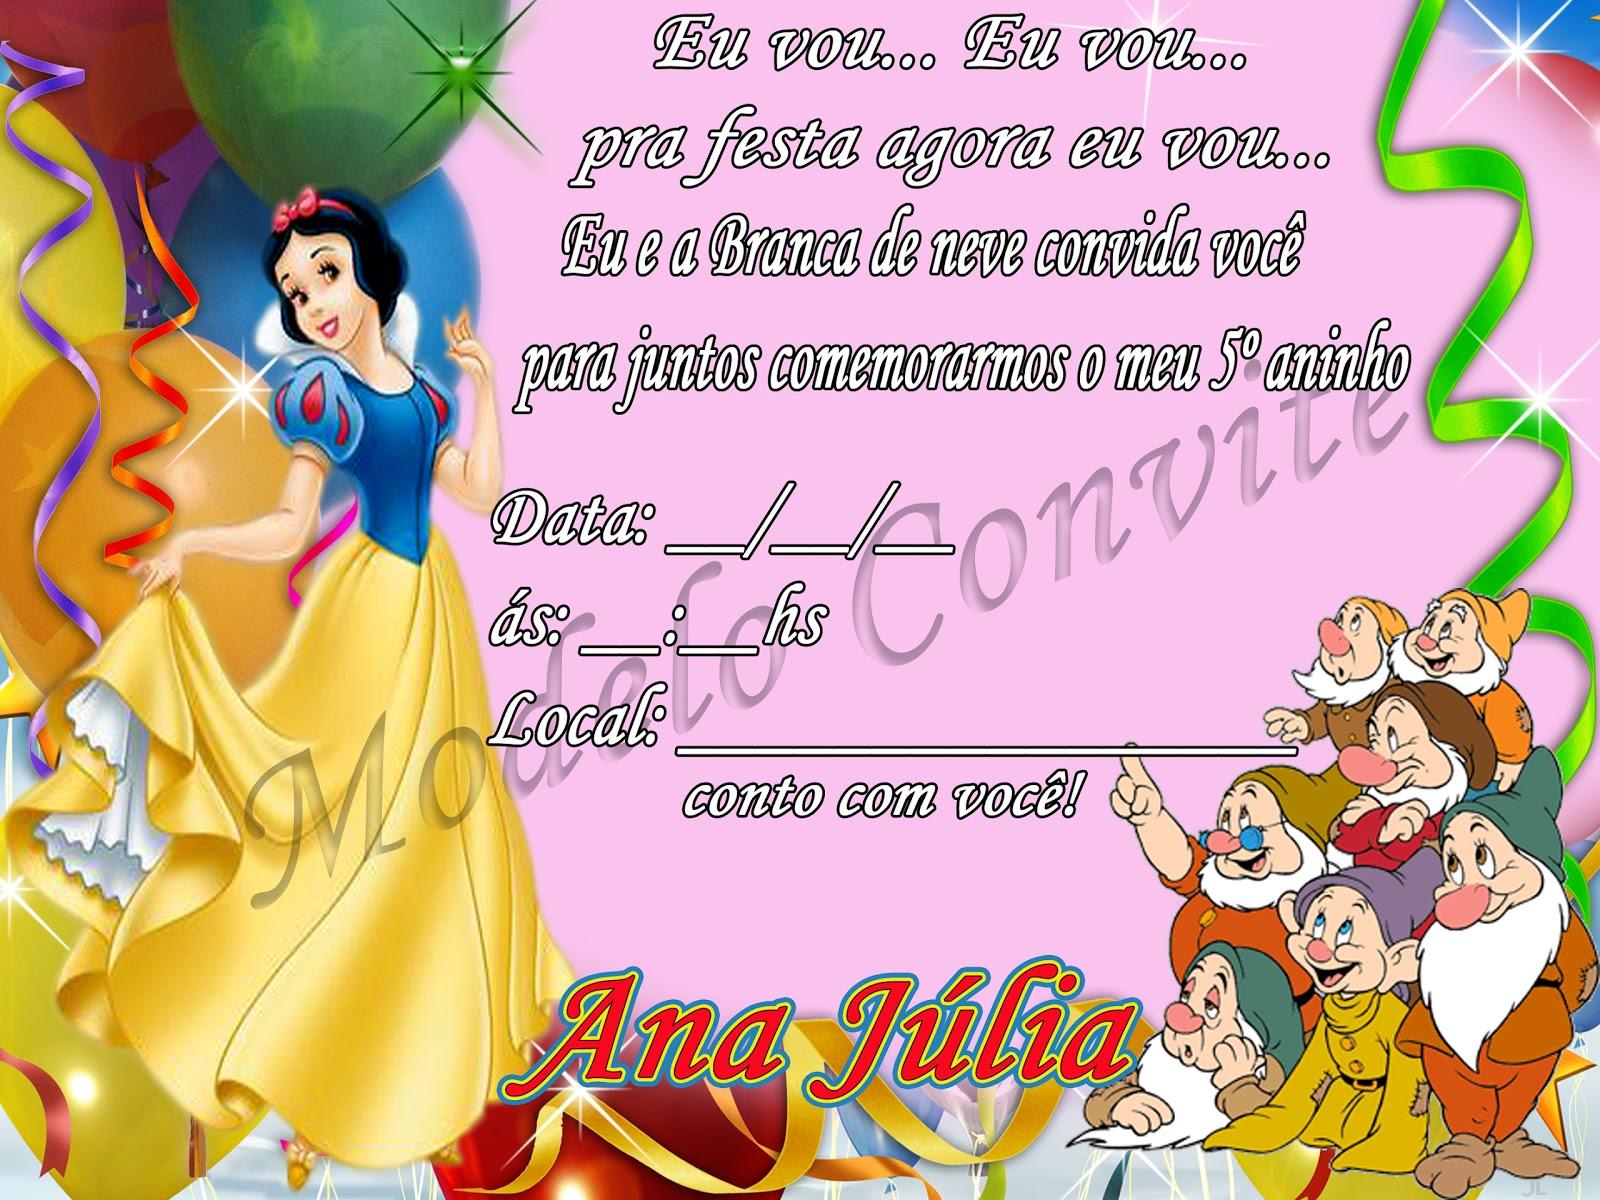 Tag Frases Para Convite De Aniversario Infantil Branca De Neve